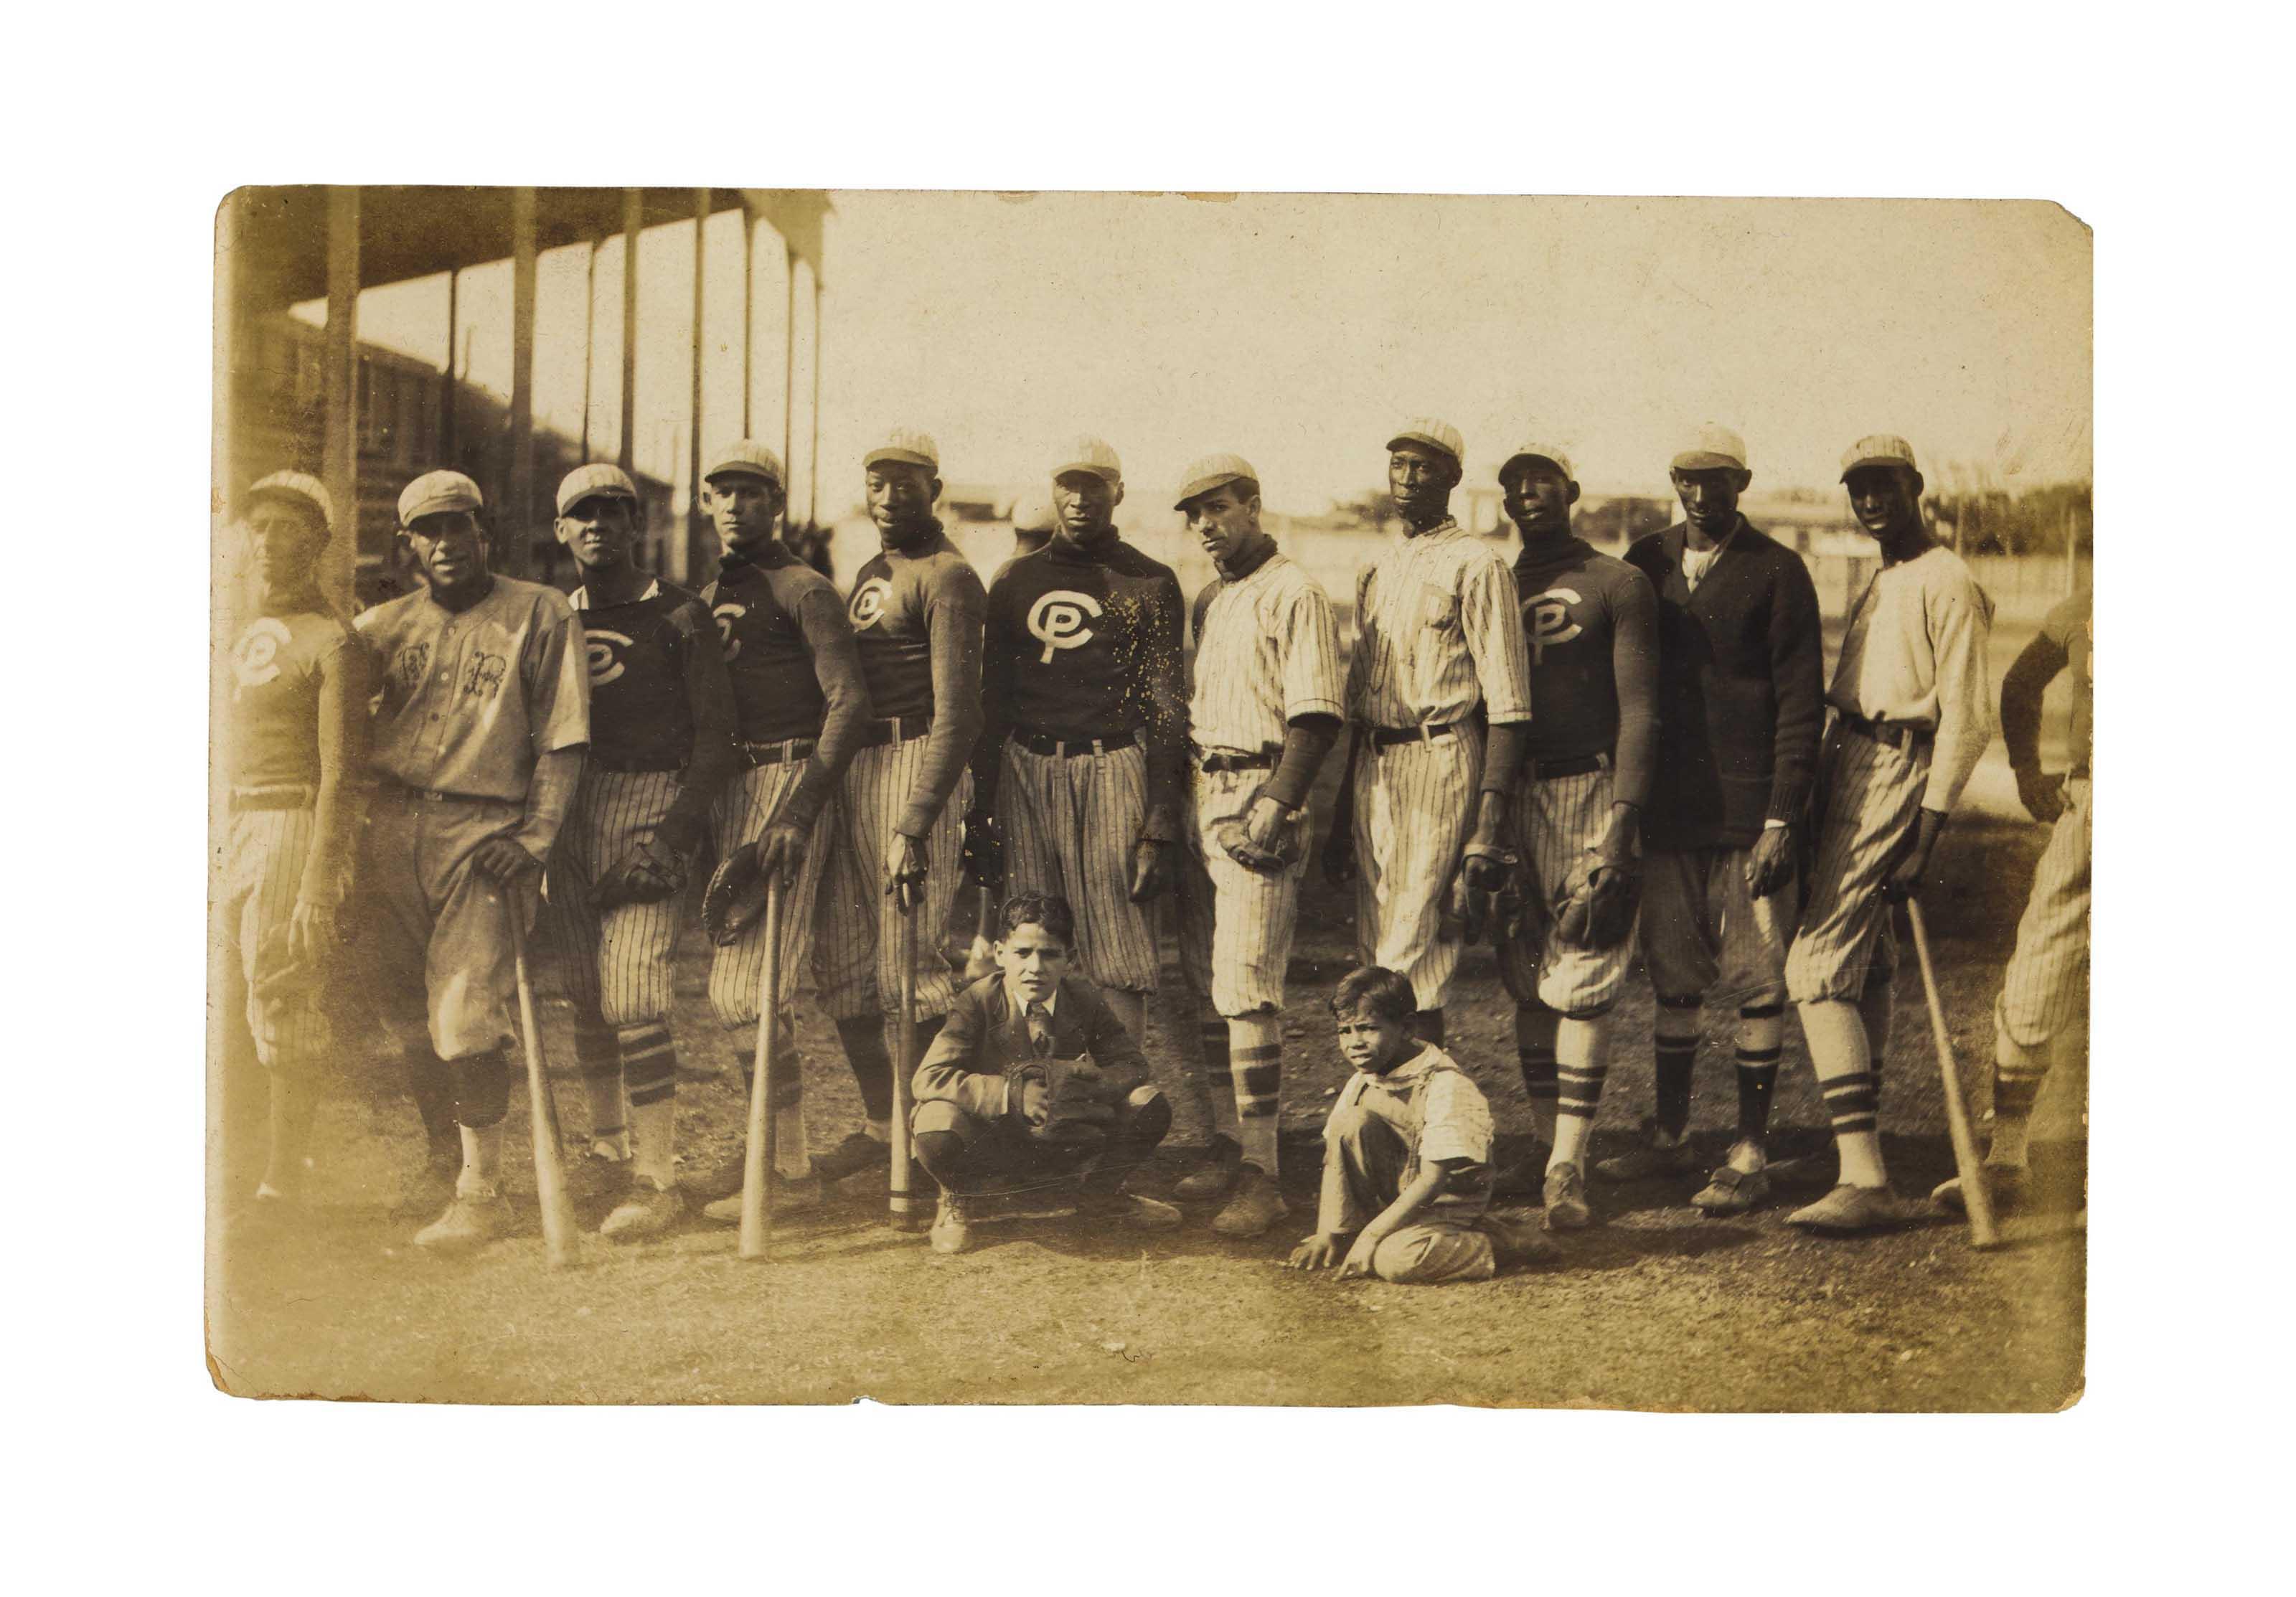 1921 PIRATES DE MATANZA PHOTOG